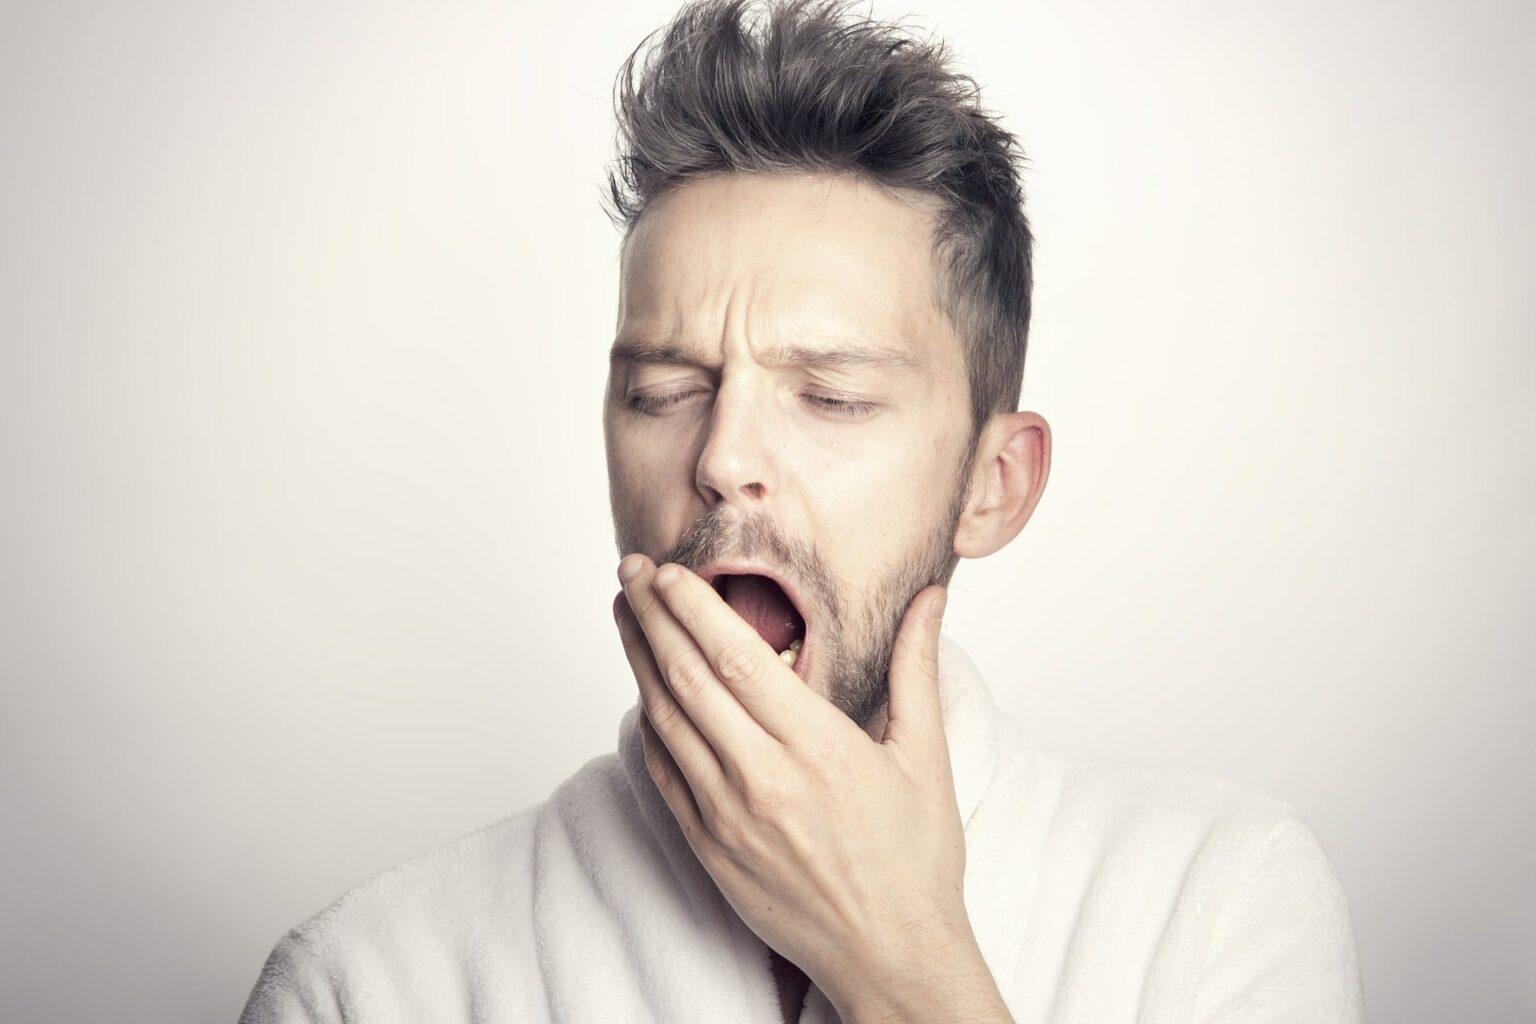 man yawning because he's tired